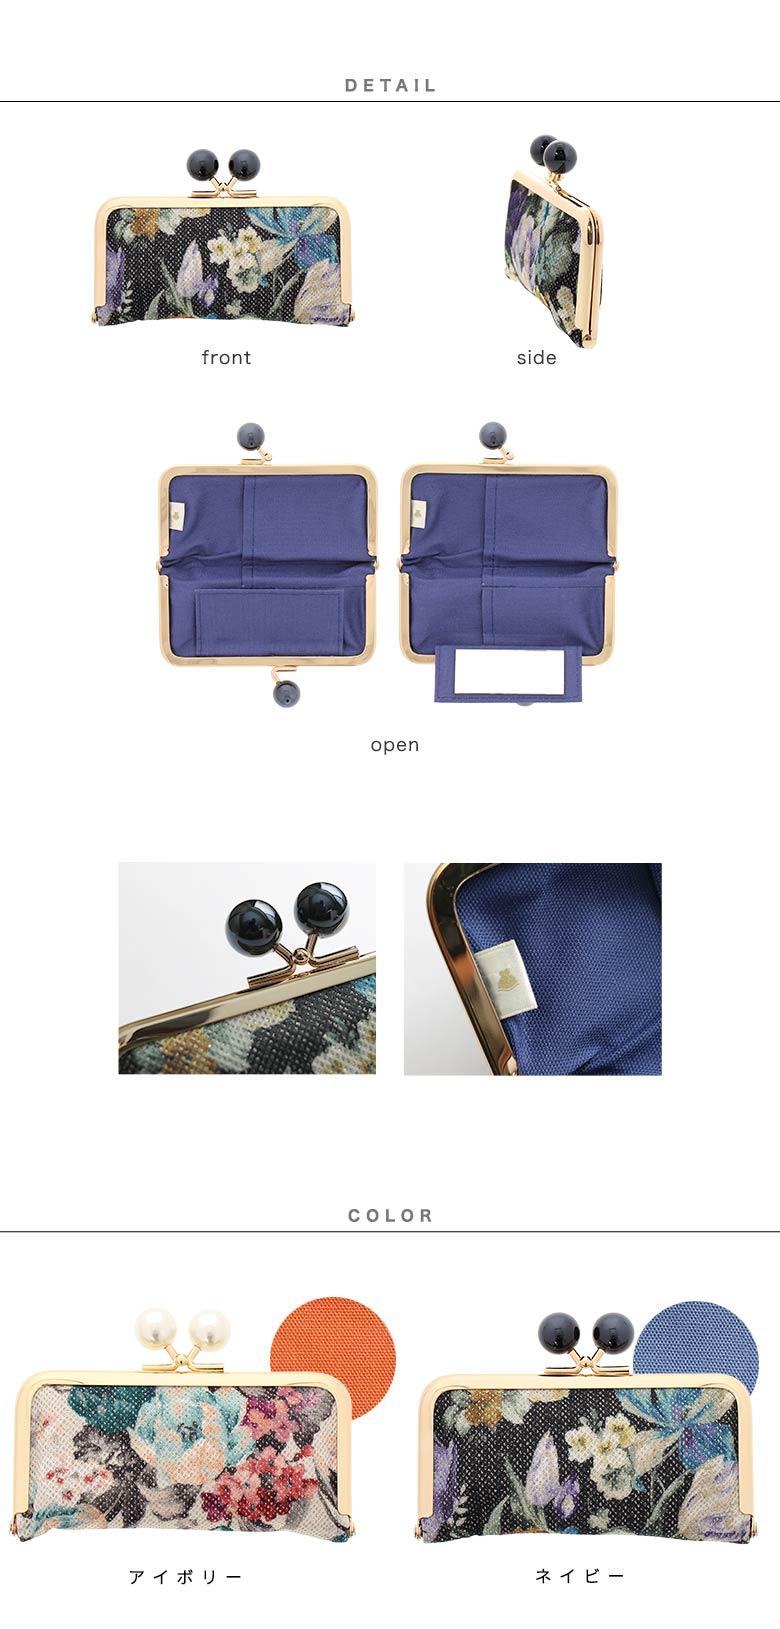 AYANOKOJI シャインフラワーシリーズ ポケット付きがま口リップケース detail COLOR アイボリー、ネイビー